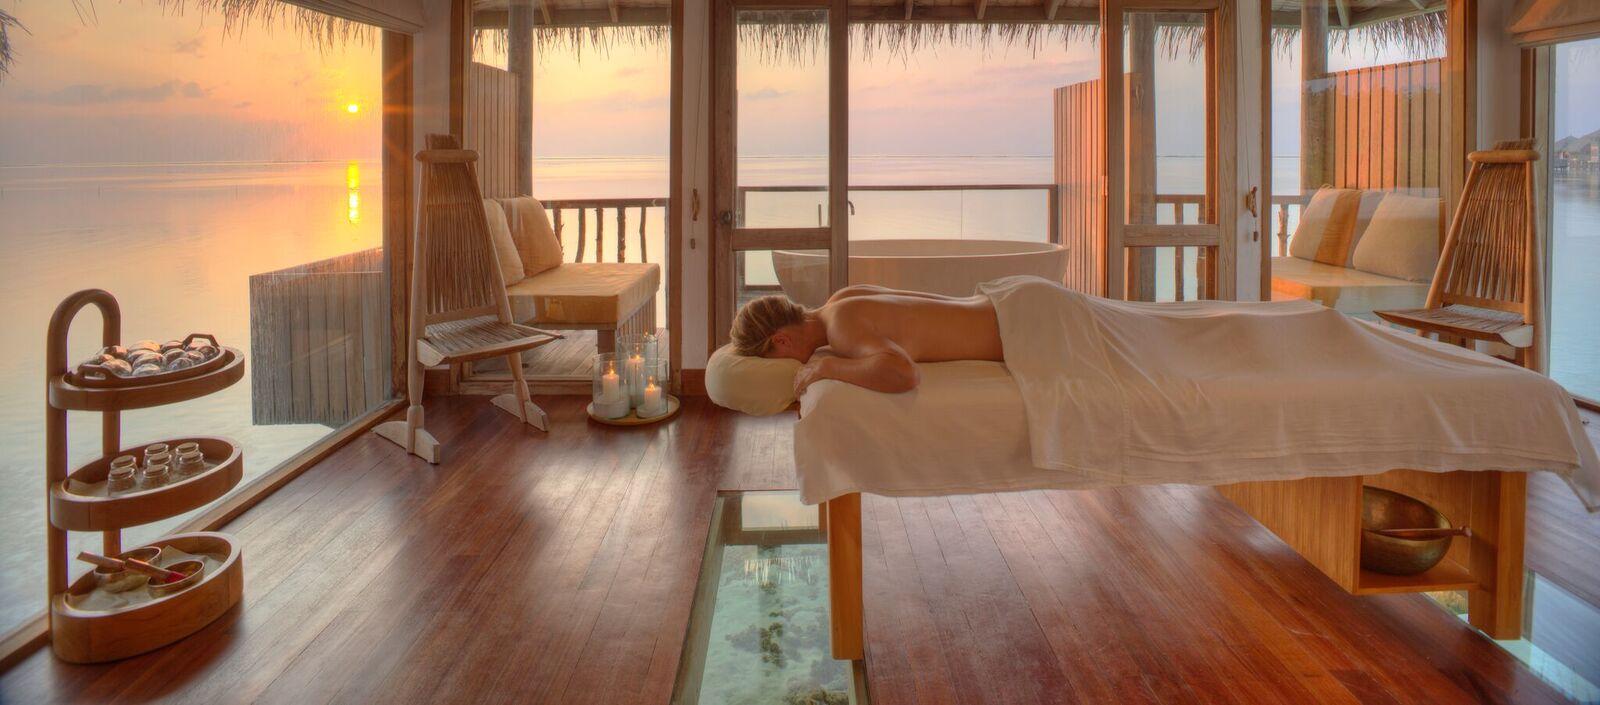 Meera Spa Treatment